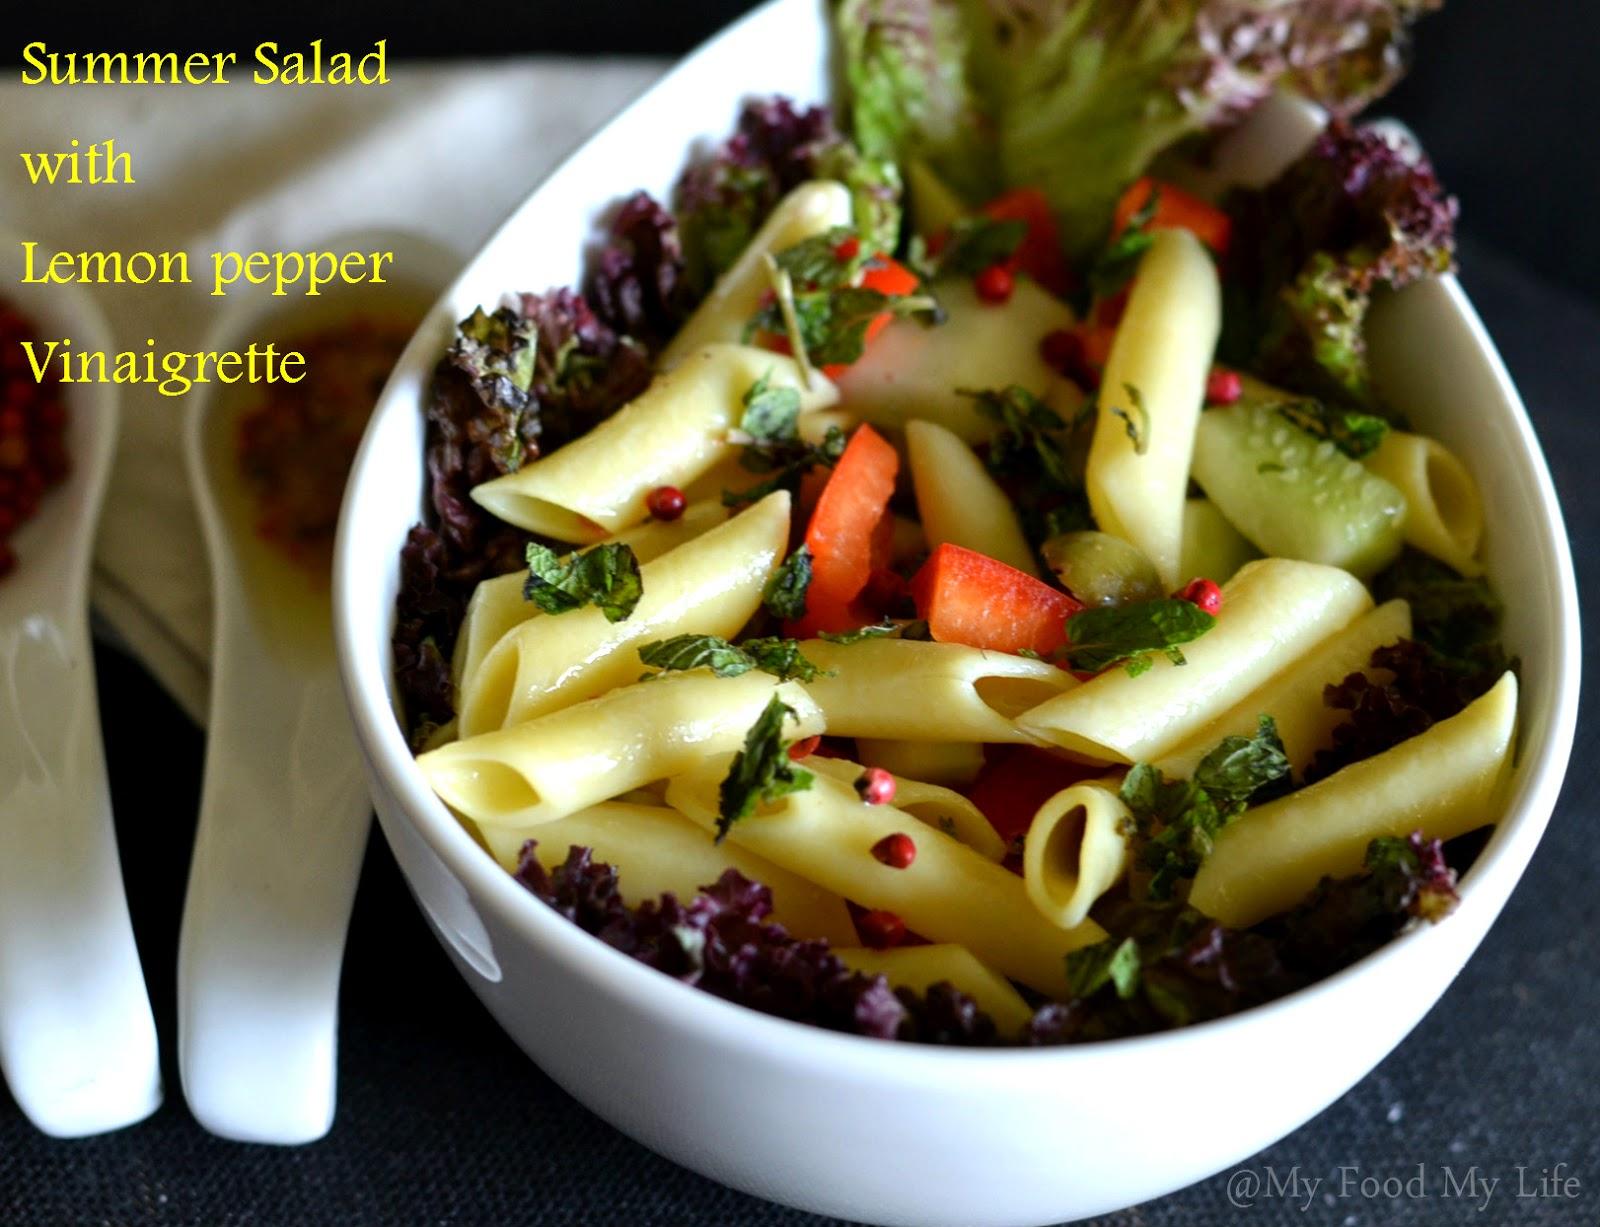 My Food My Life : Summer Salad with Lemon Pepper Vinaigrette